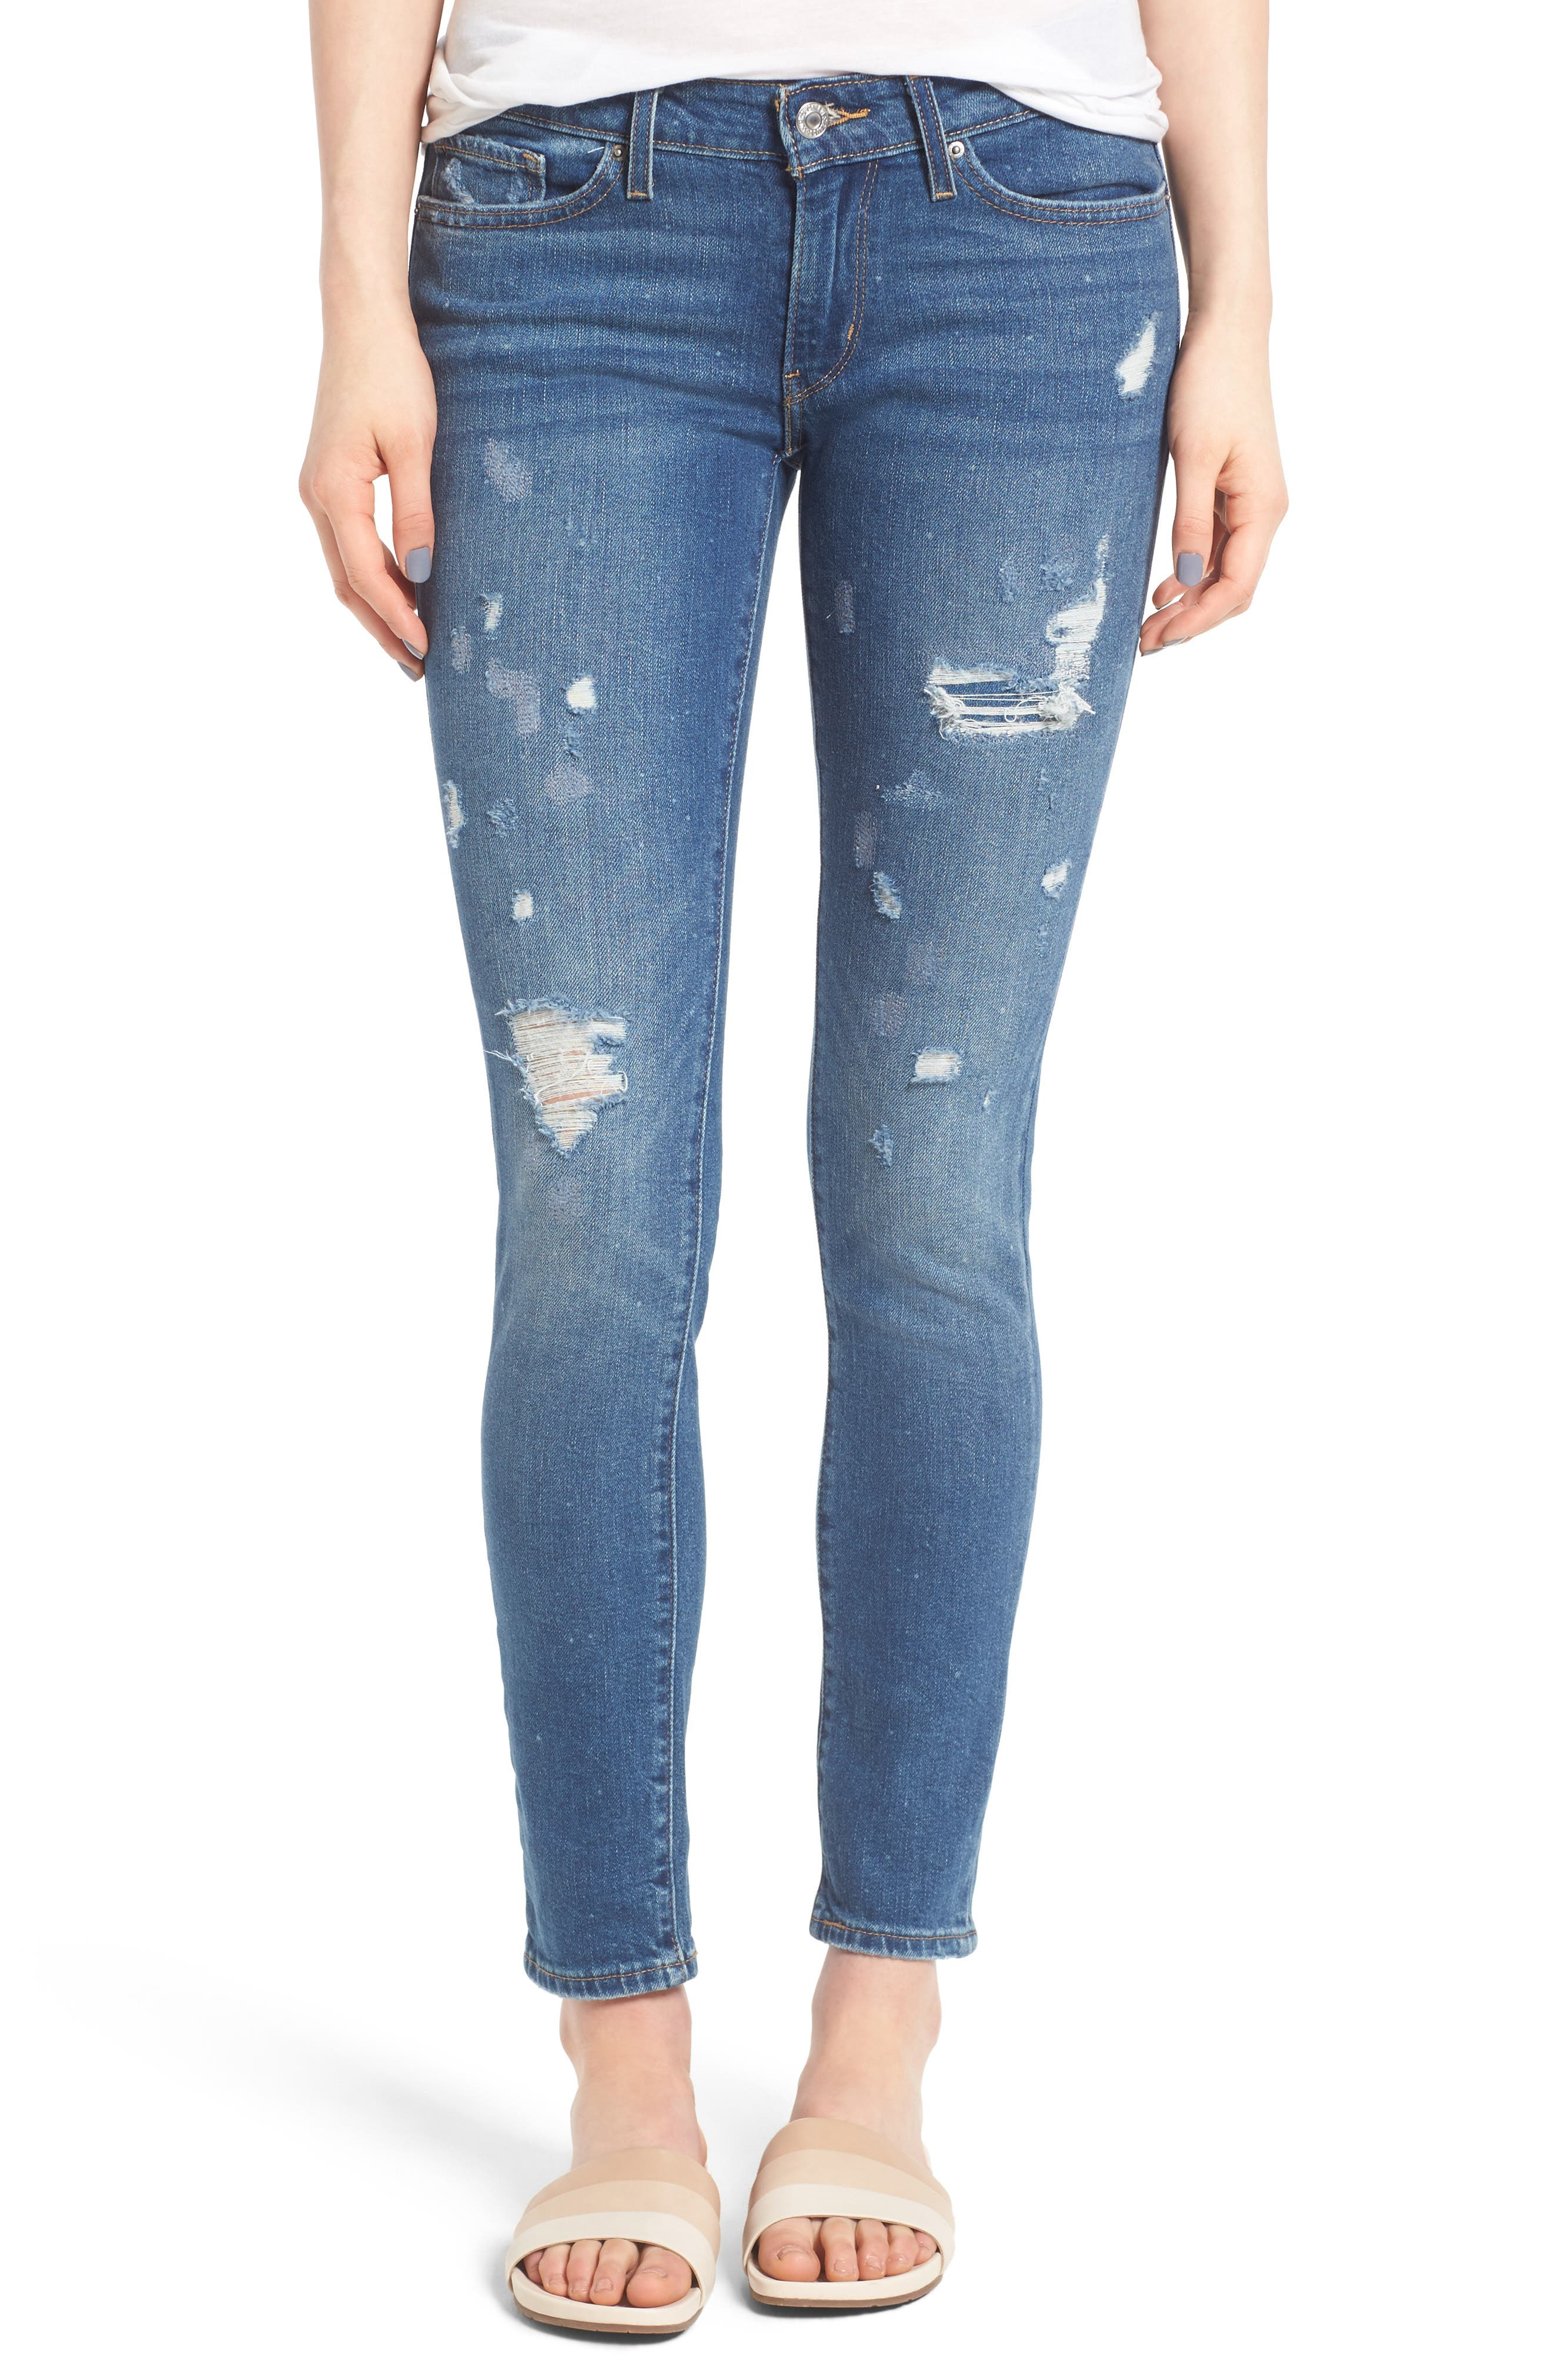 Alternate Image 1 Selected - Levi's® 711 Skinny Jeans